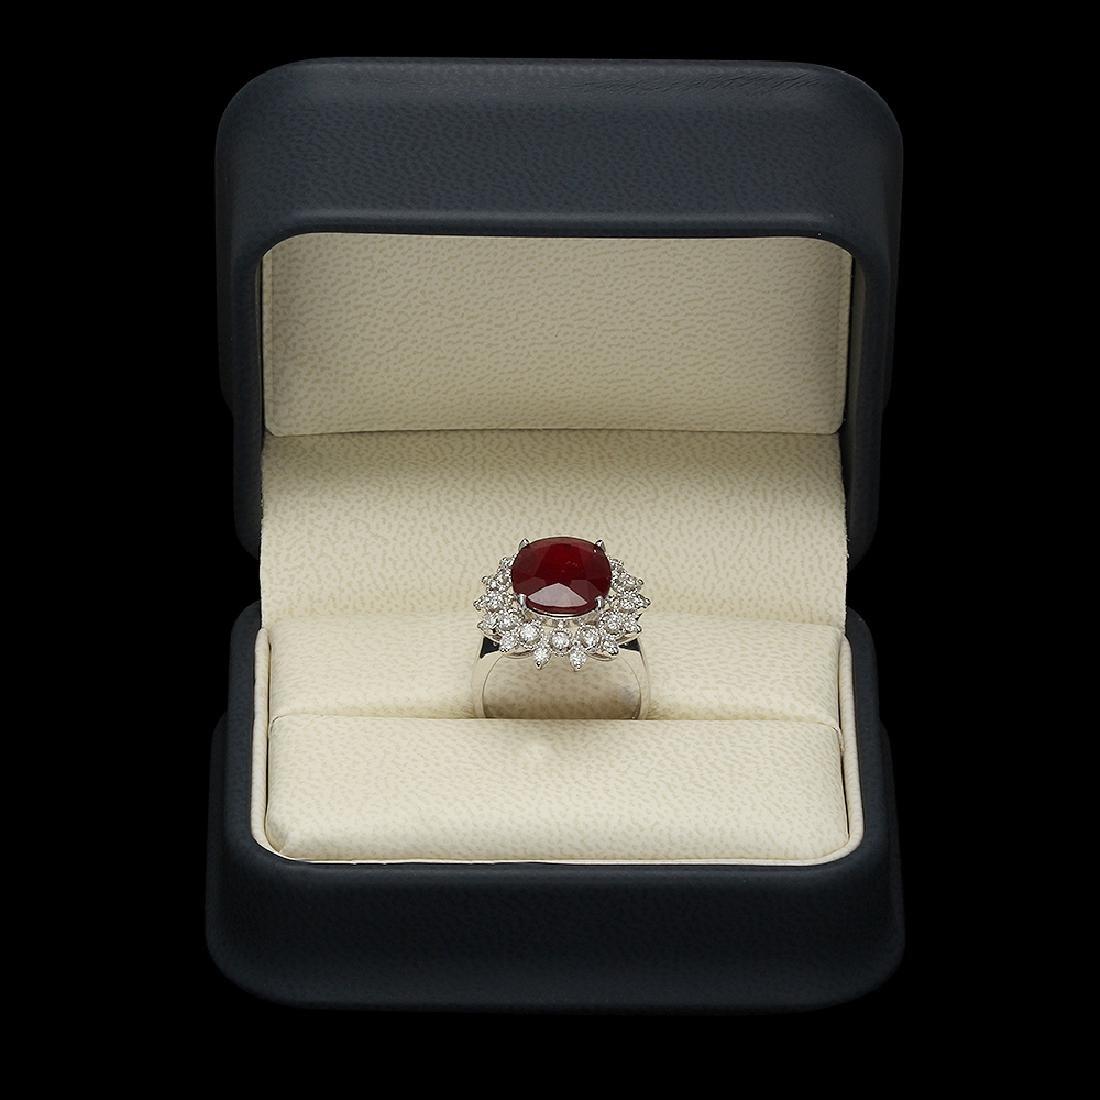 14K Gold 6.06ct Ruby 0.71ct Diamond Ring - 3